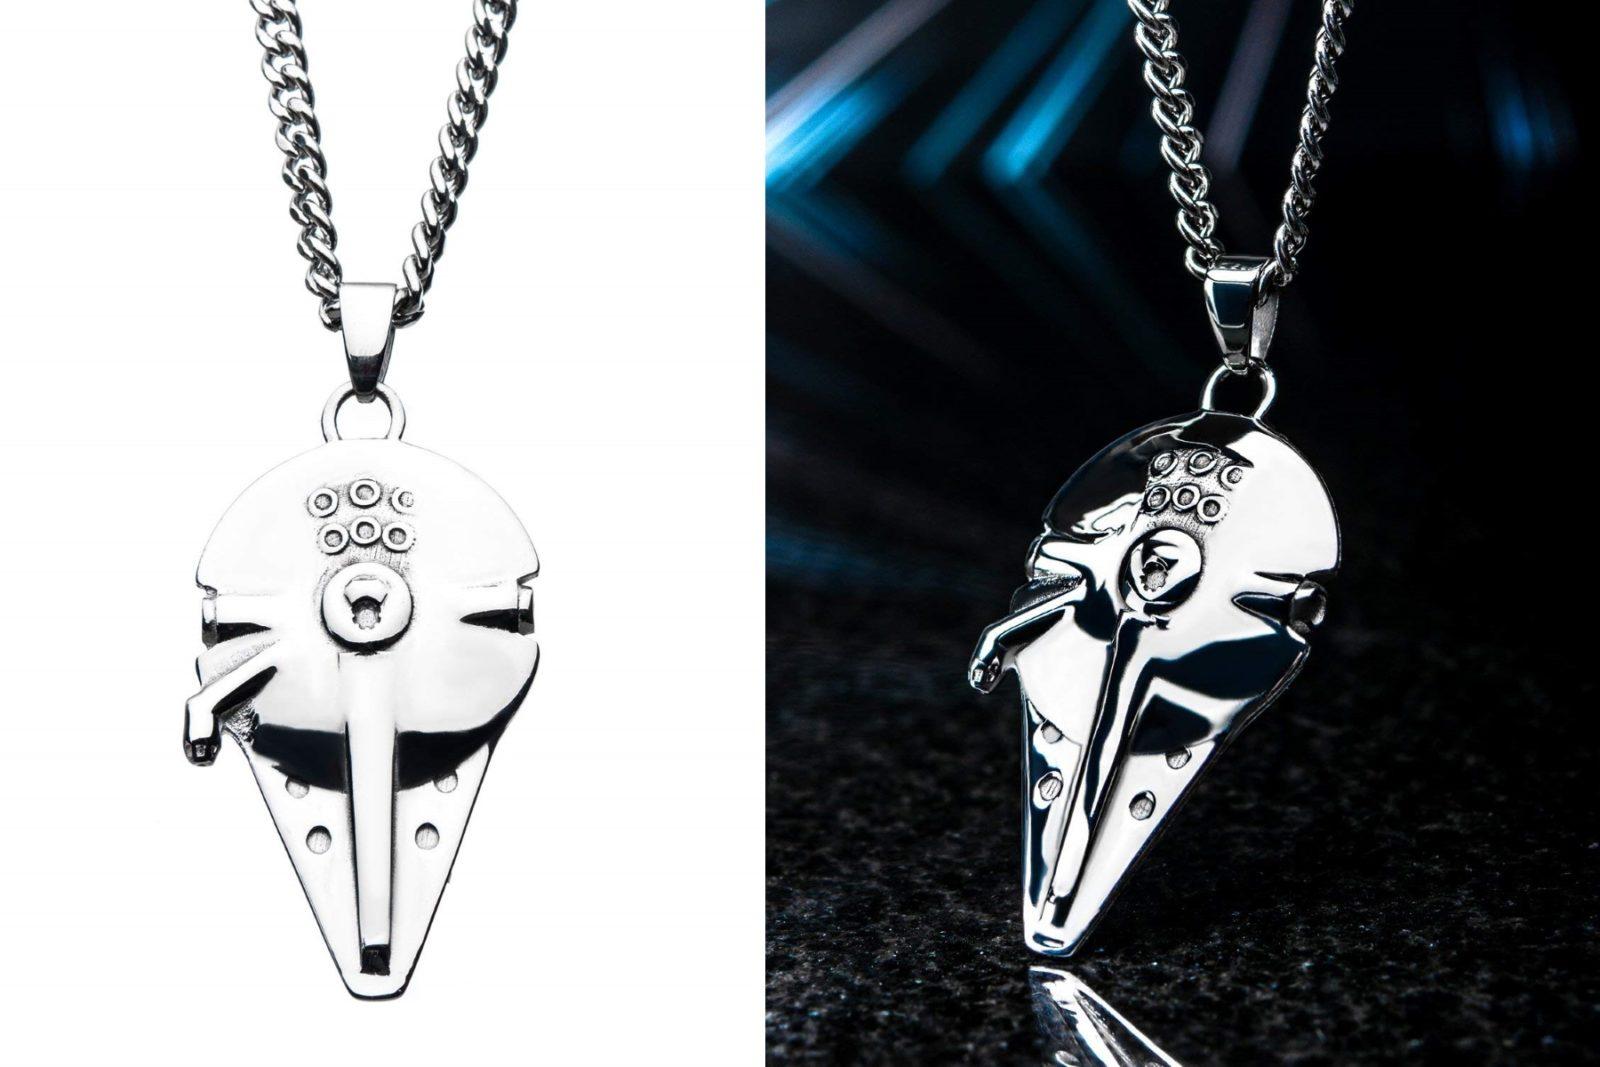 Body Vibe x Star Wars Solo Millennium Falcon Necklace on Amazon